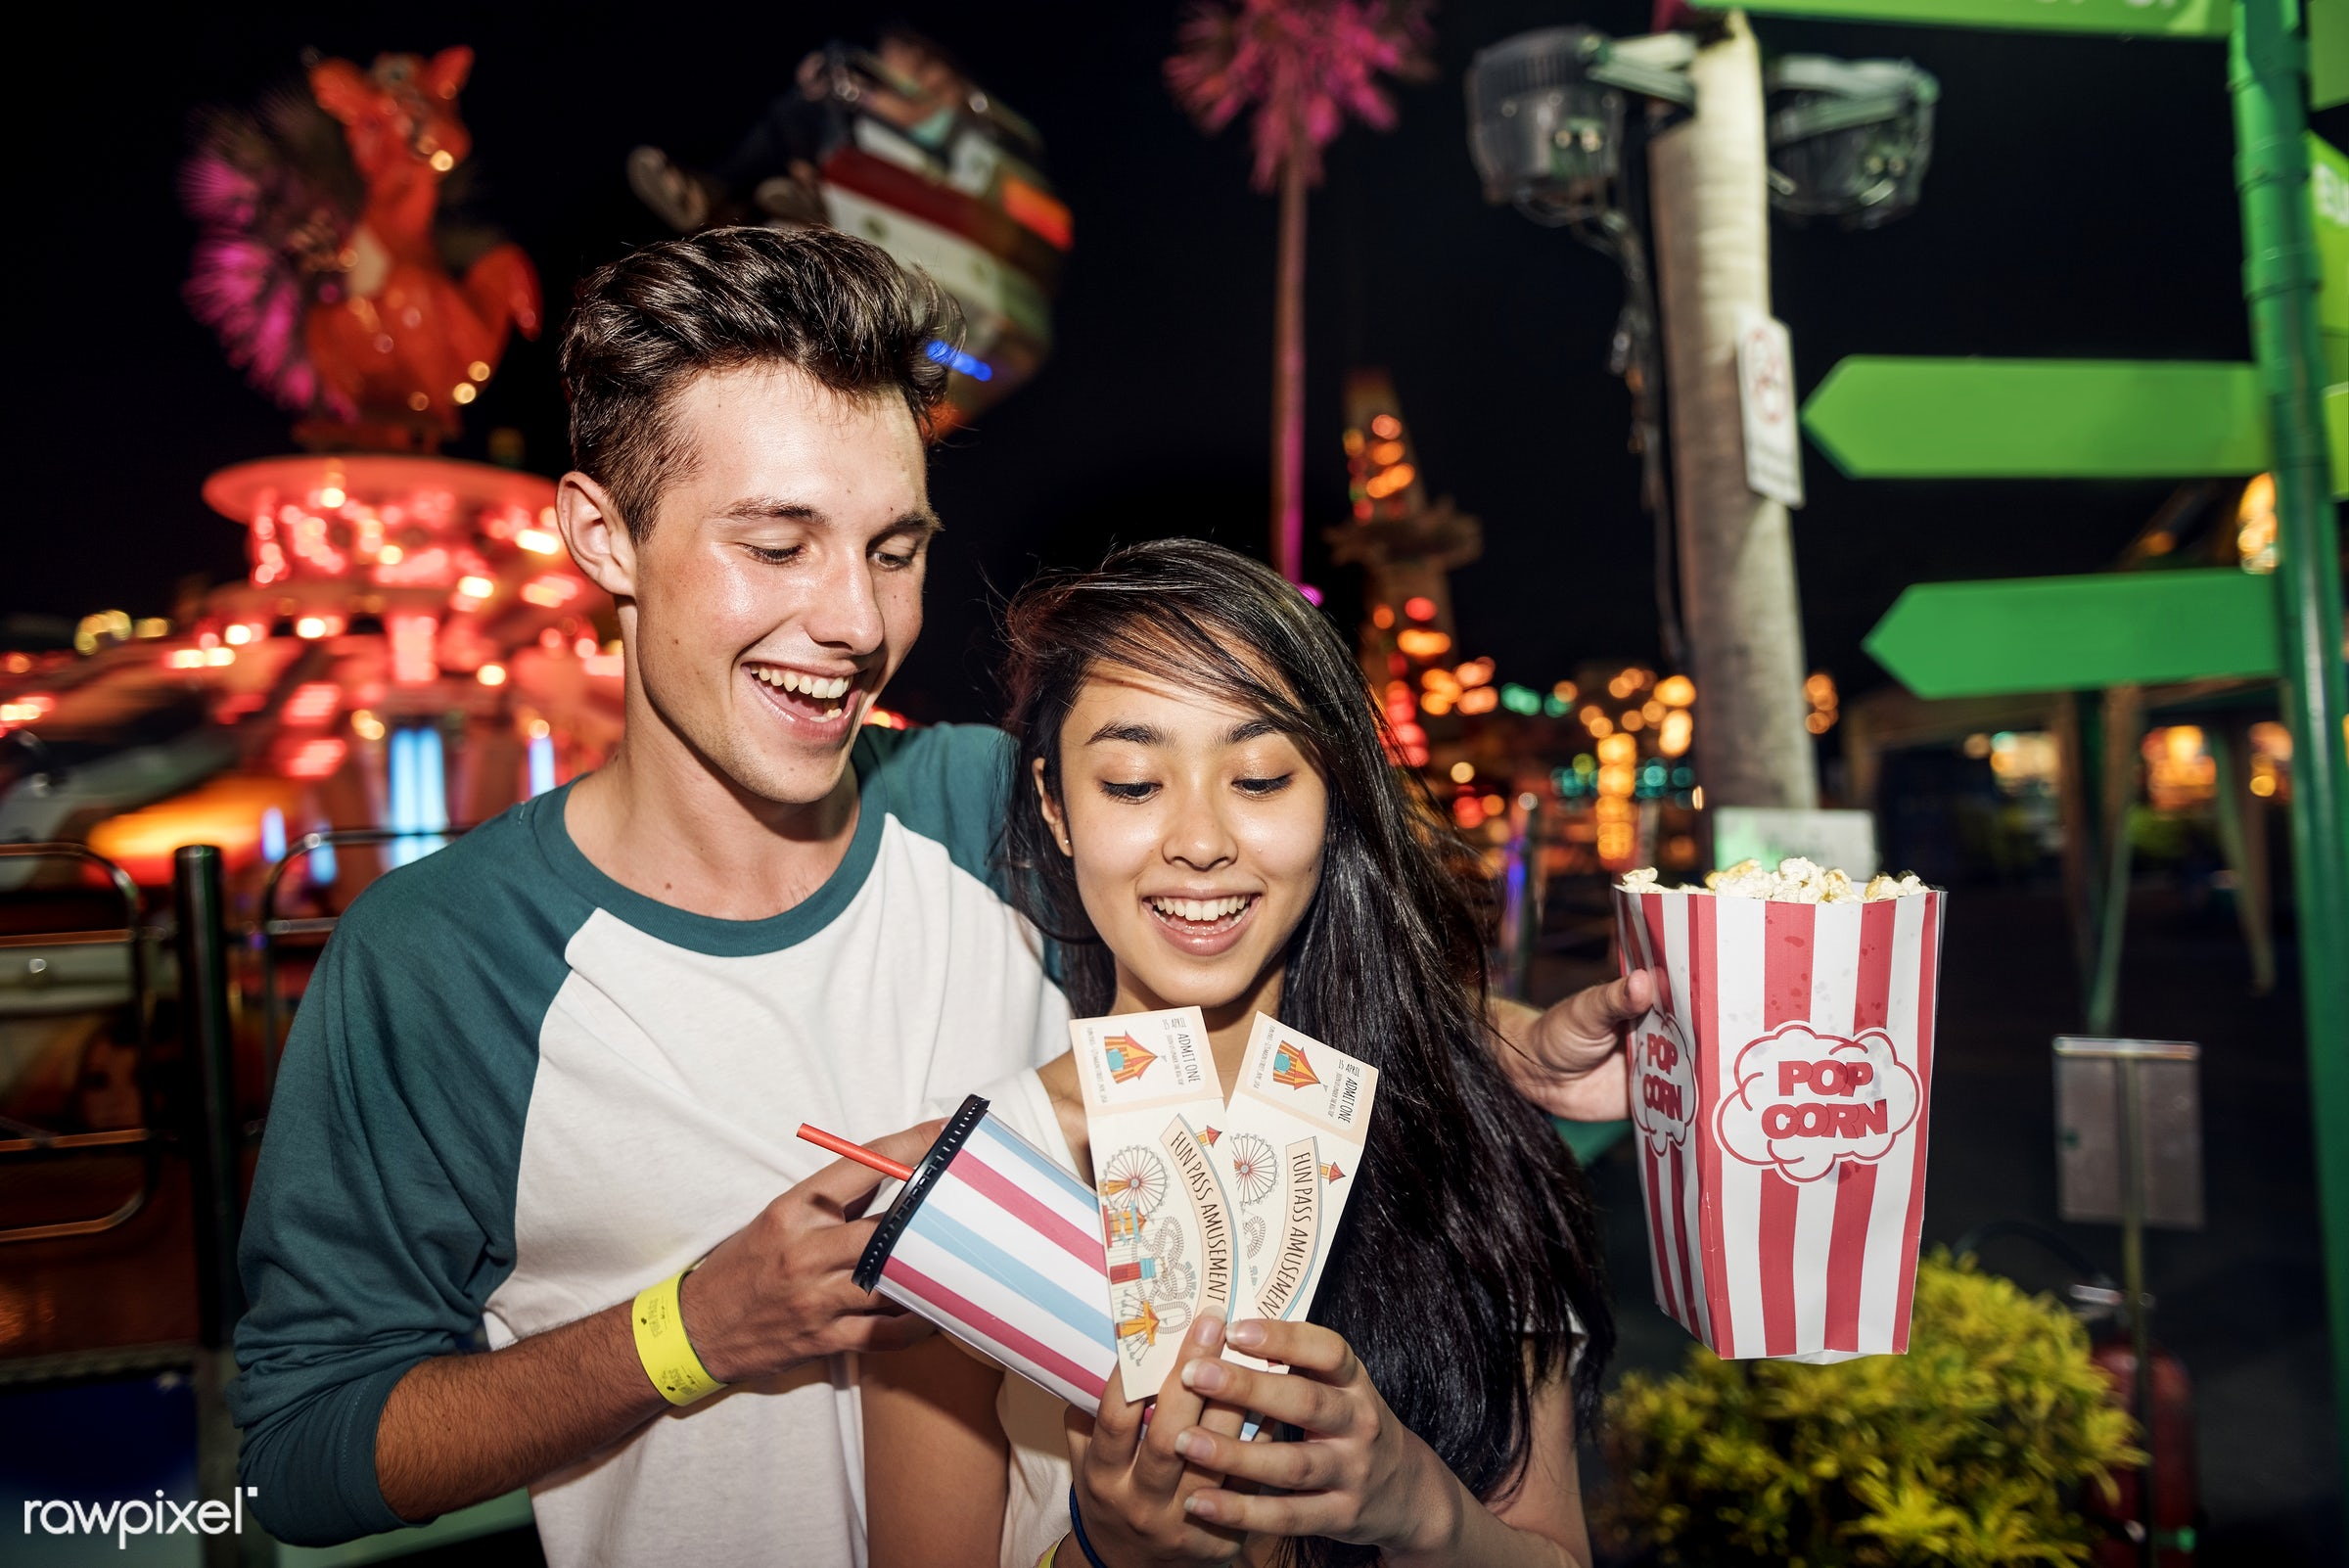 american, amusement park, asian, beautiful, boyfriend, candid, care, carnival, couple, dating, drink, enjoying, european,...